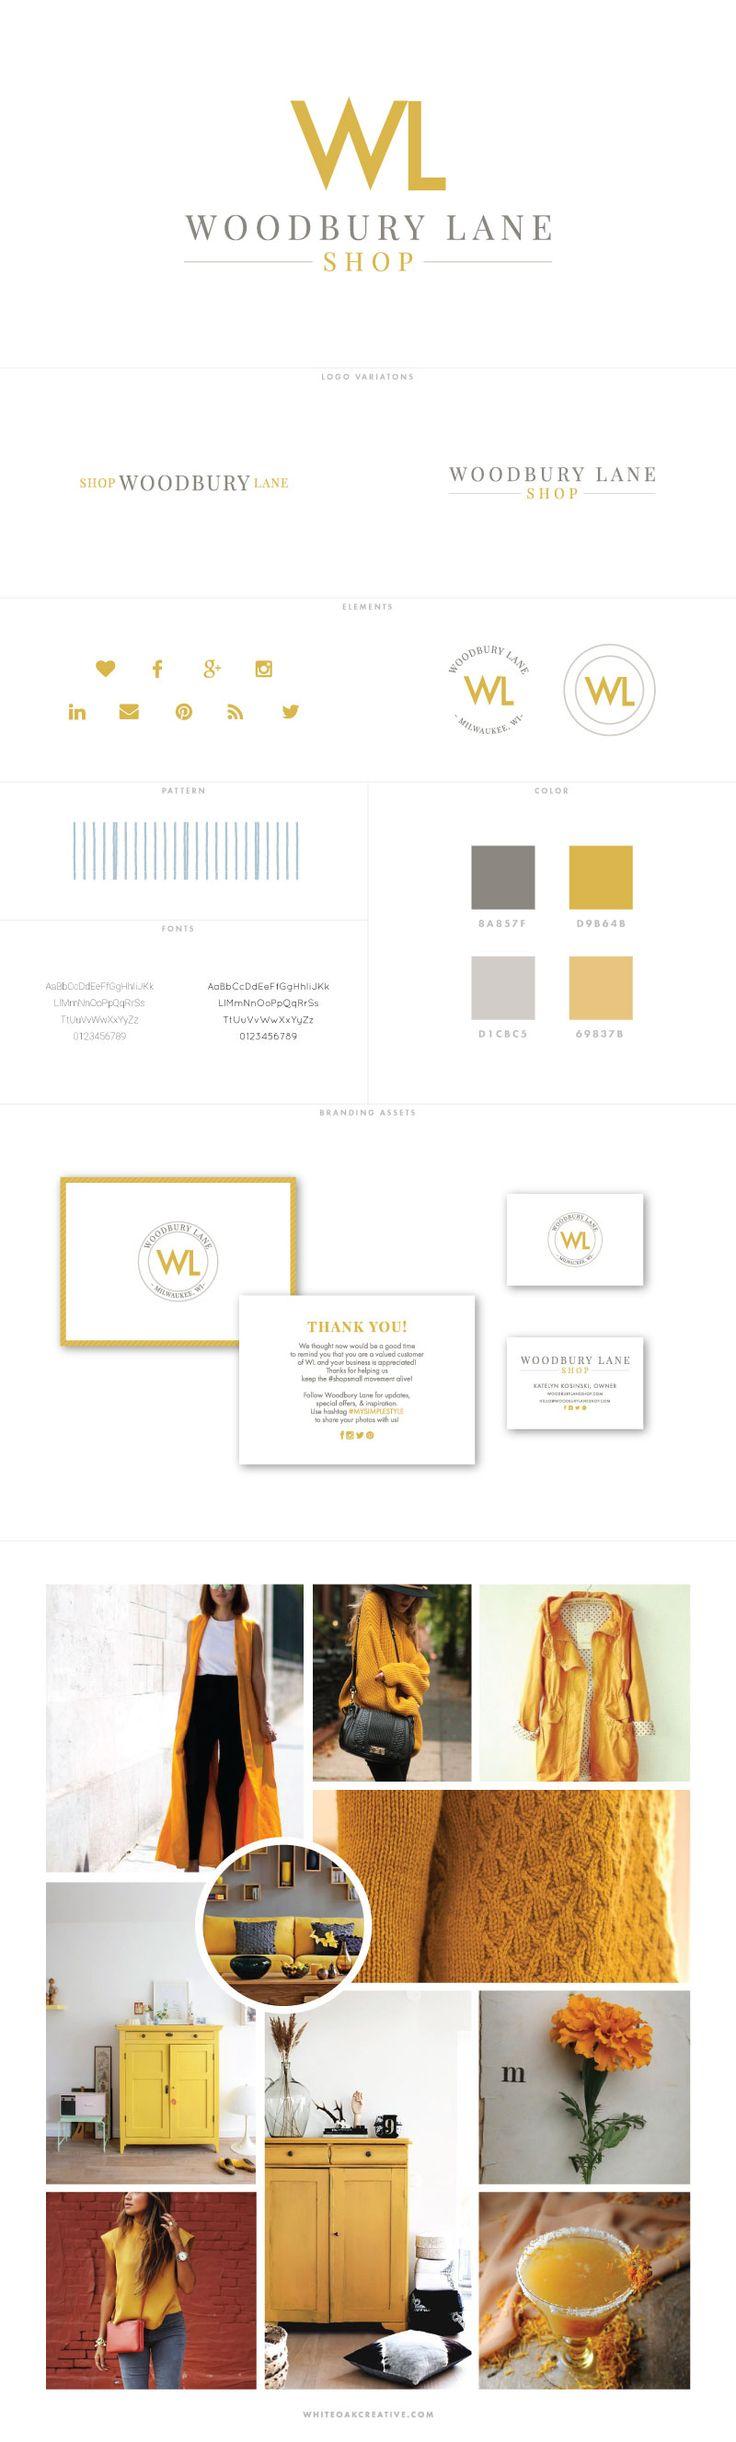 Custom Branding for Woodbury Lane - logo design, wordpress theme, mood board inspiration, blog design idea, graphic design, branding